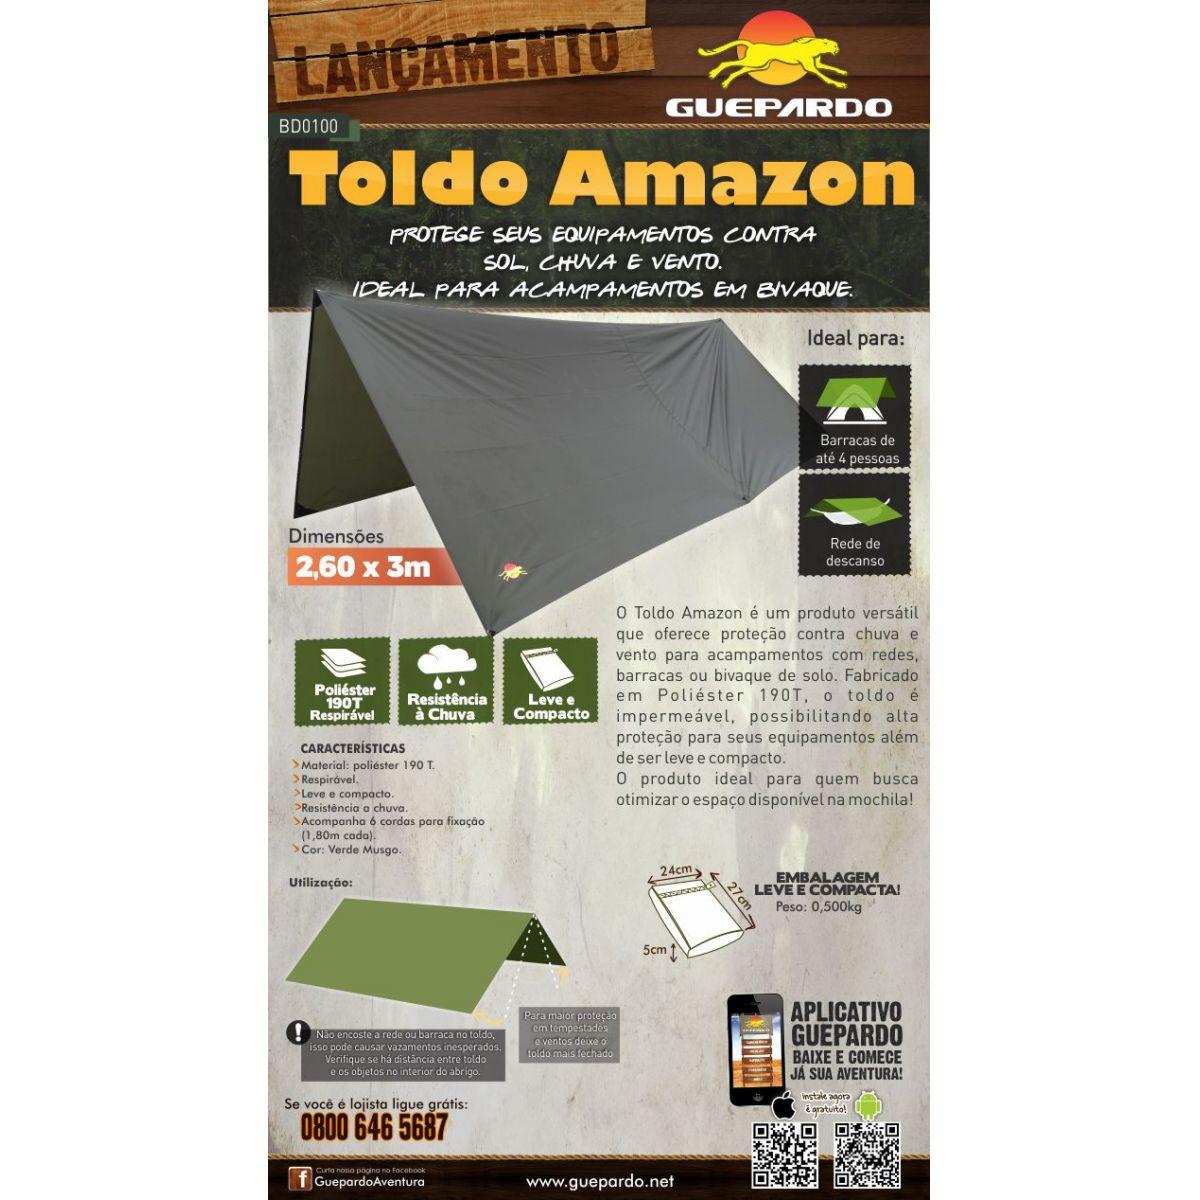 Toldo Amazon Guepardo